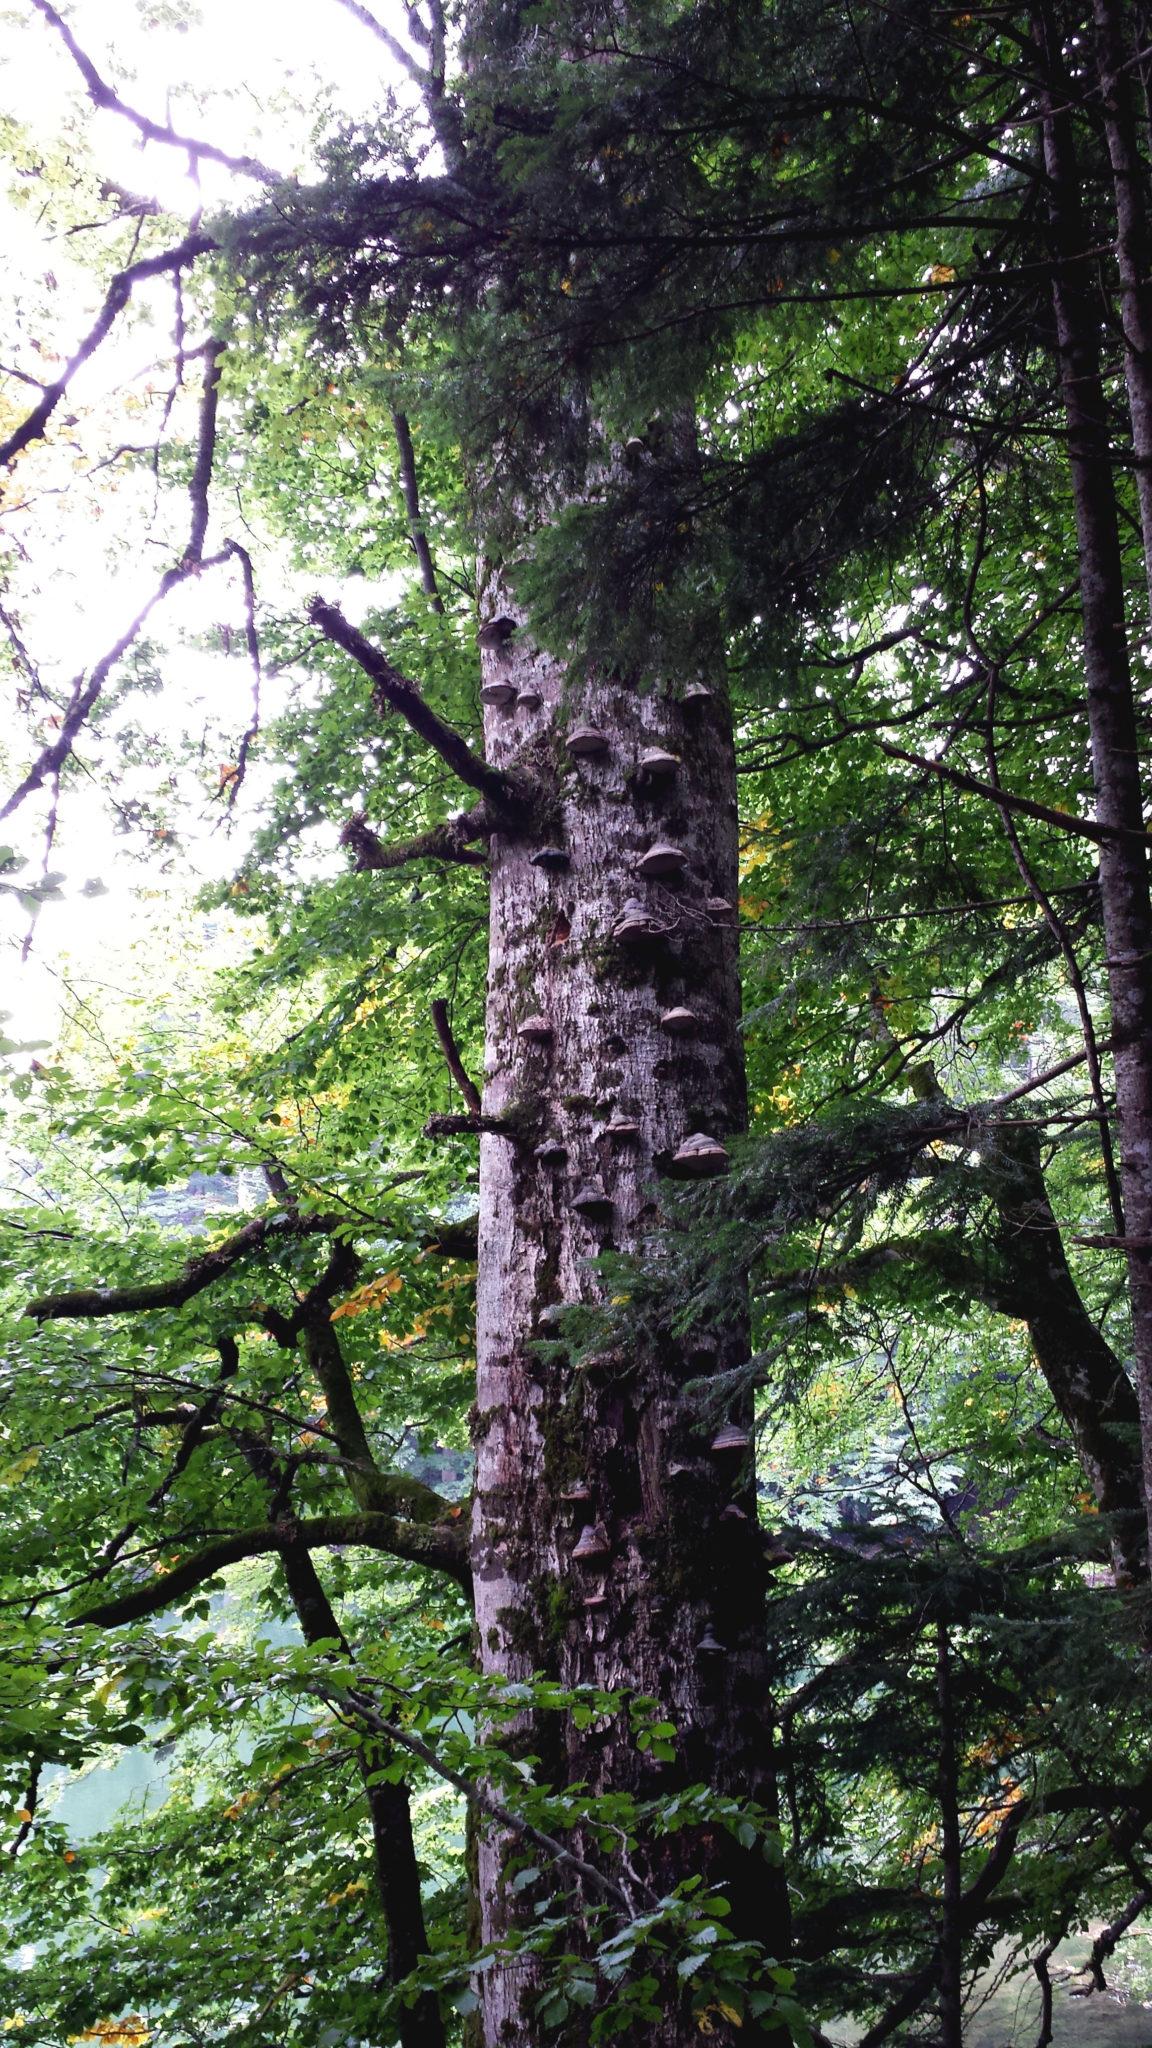 Hema_Montenegro_parc_national_biogradska_gora_forest_travel_voyage_blog9